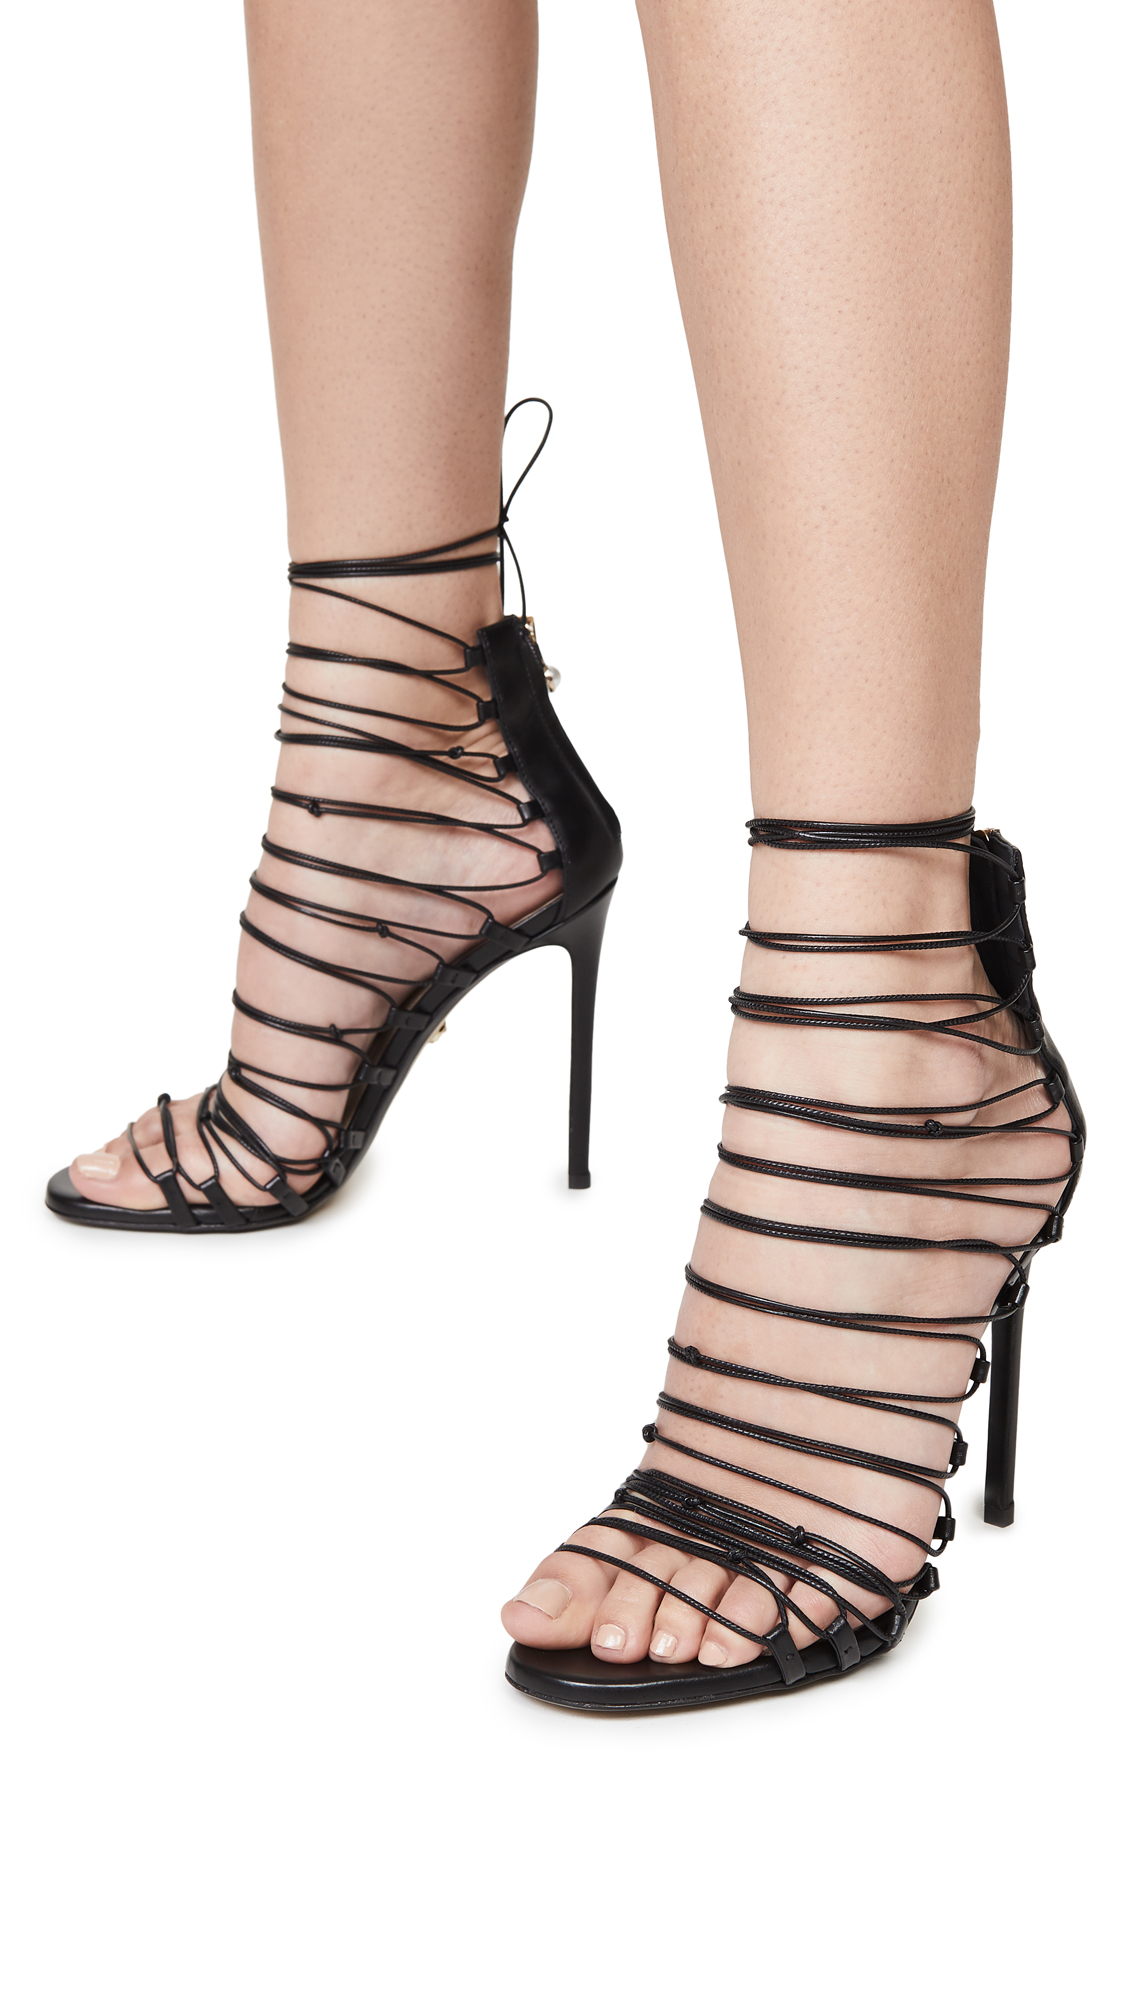 Alevi Milano Caroline Sandals – 40% Off Sale